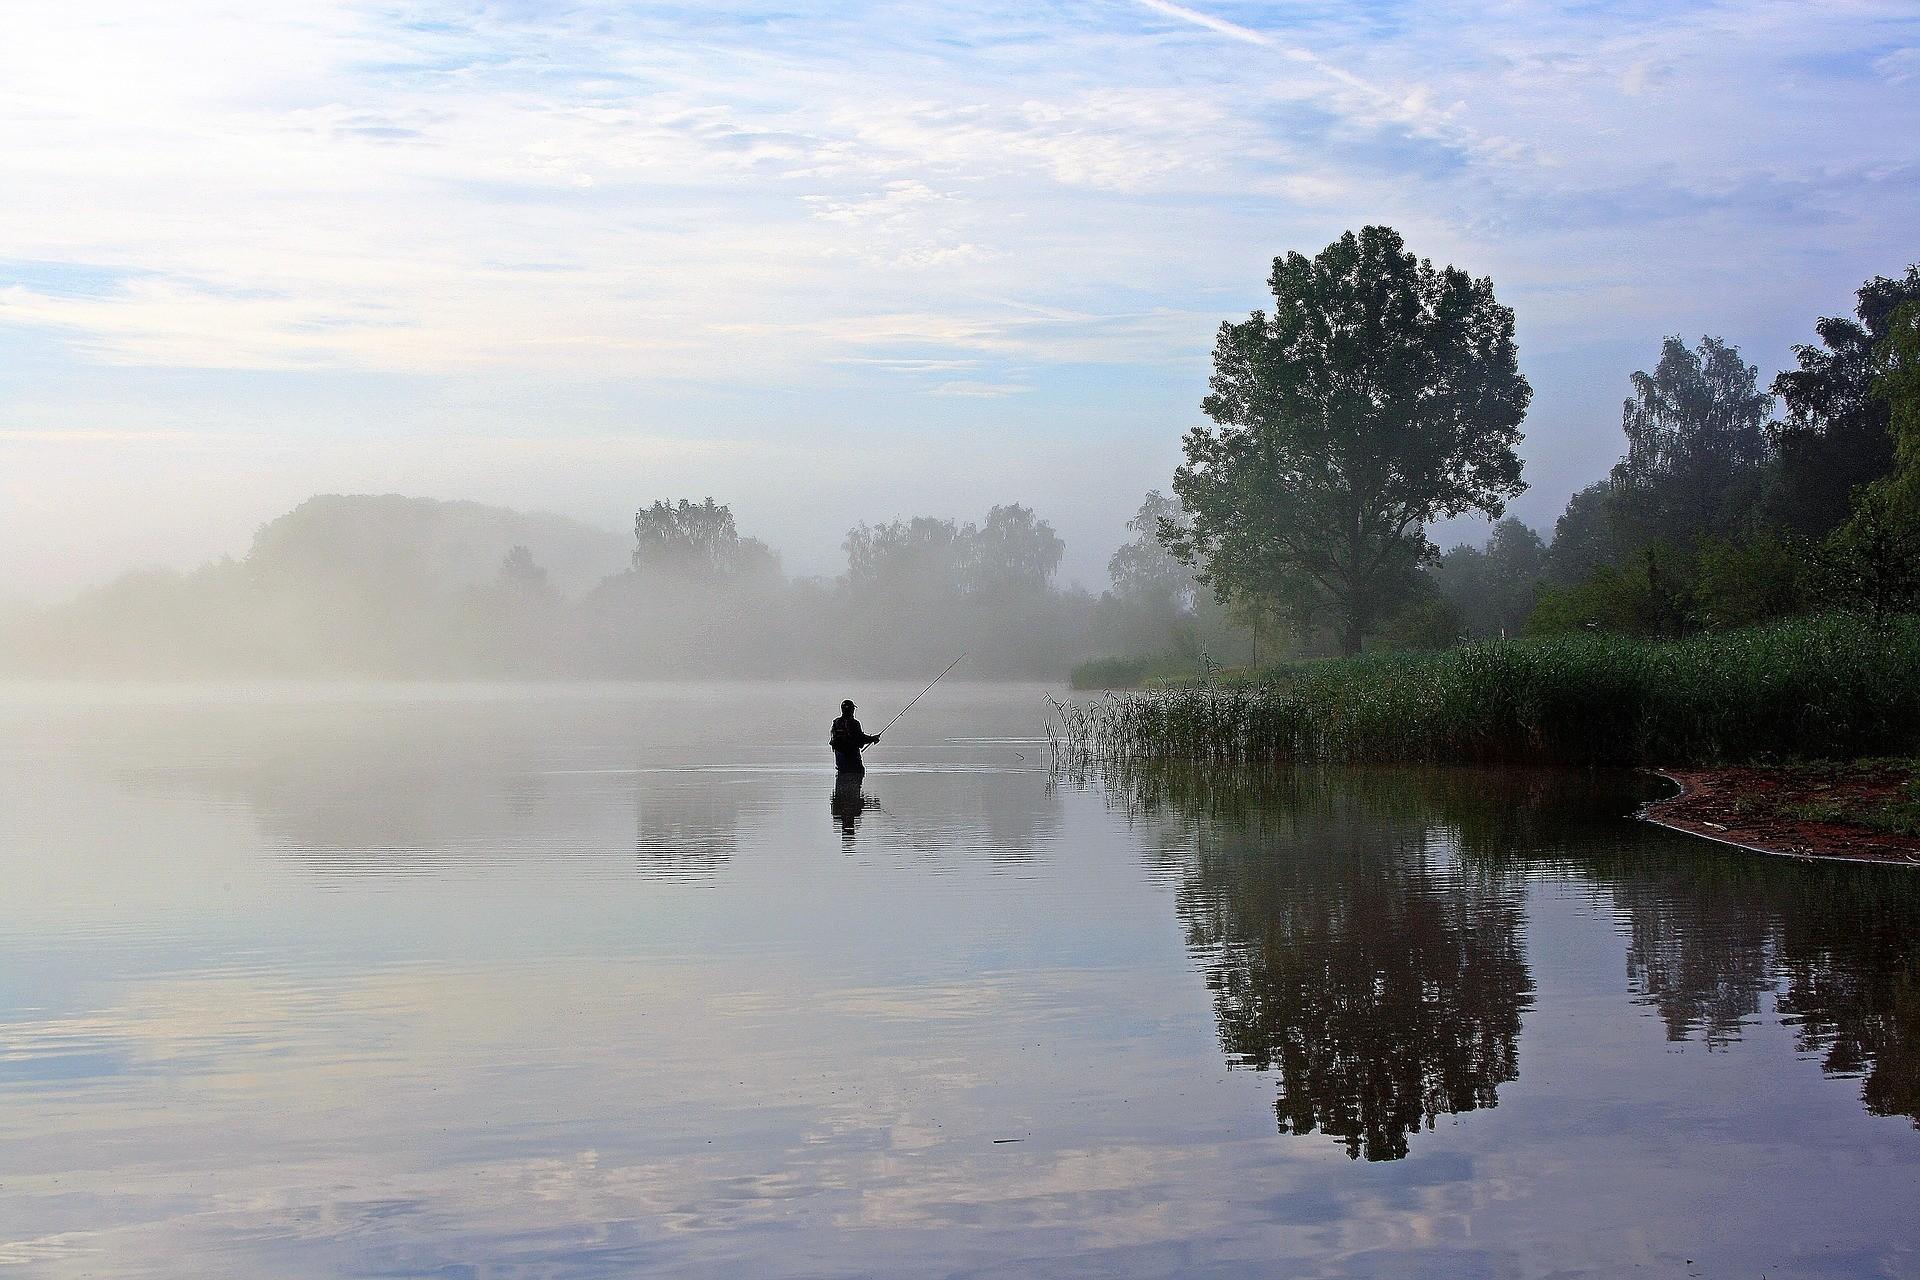 a fisherman or an angler